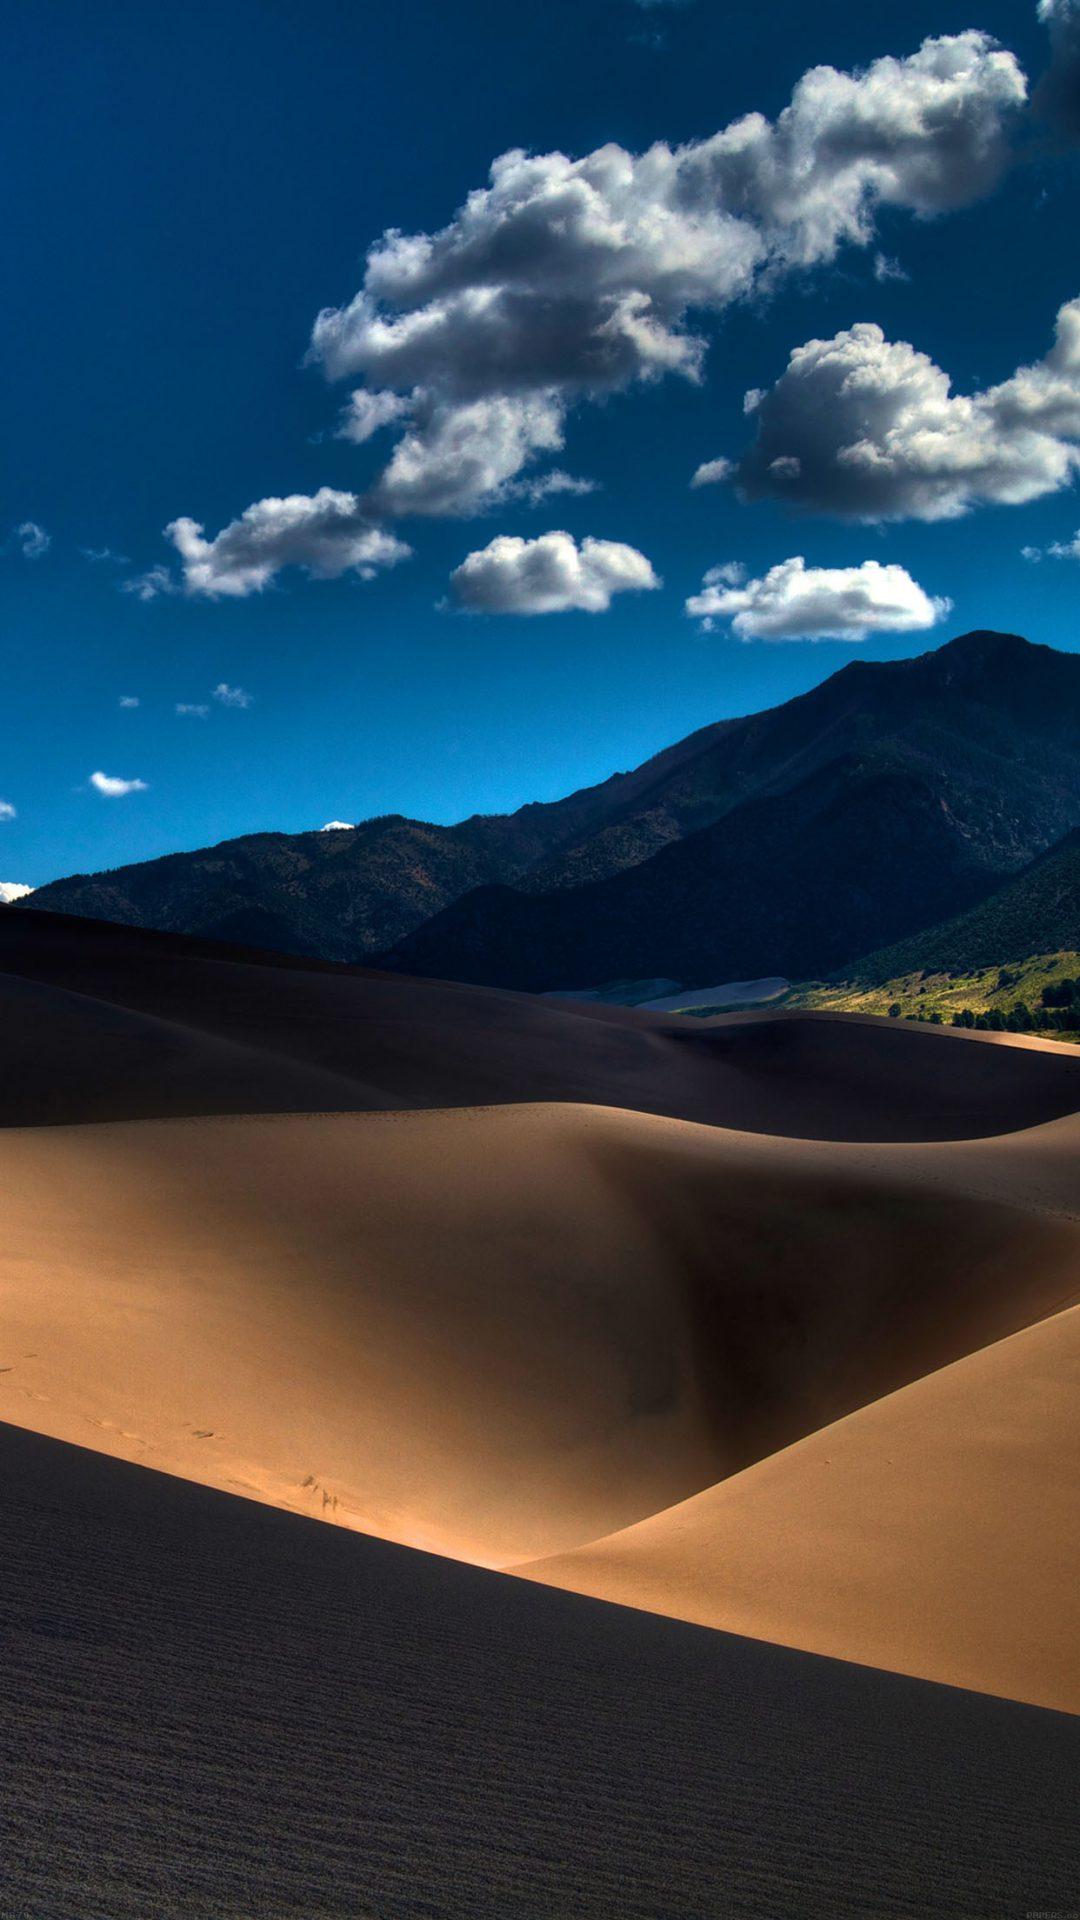 Line In Sand Desert Mountain Nature